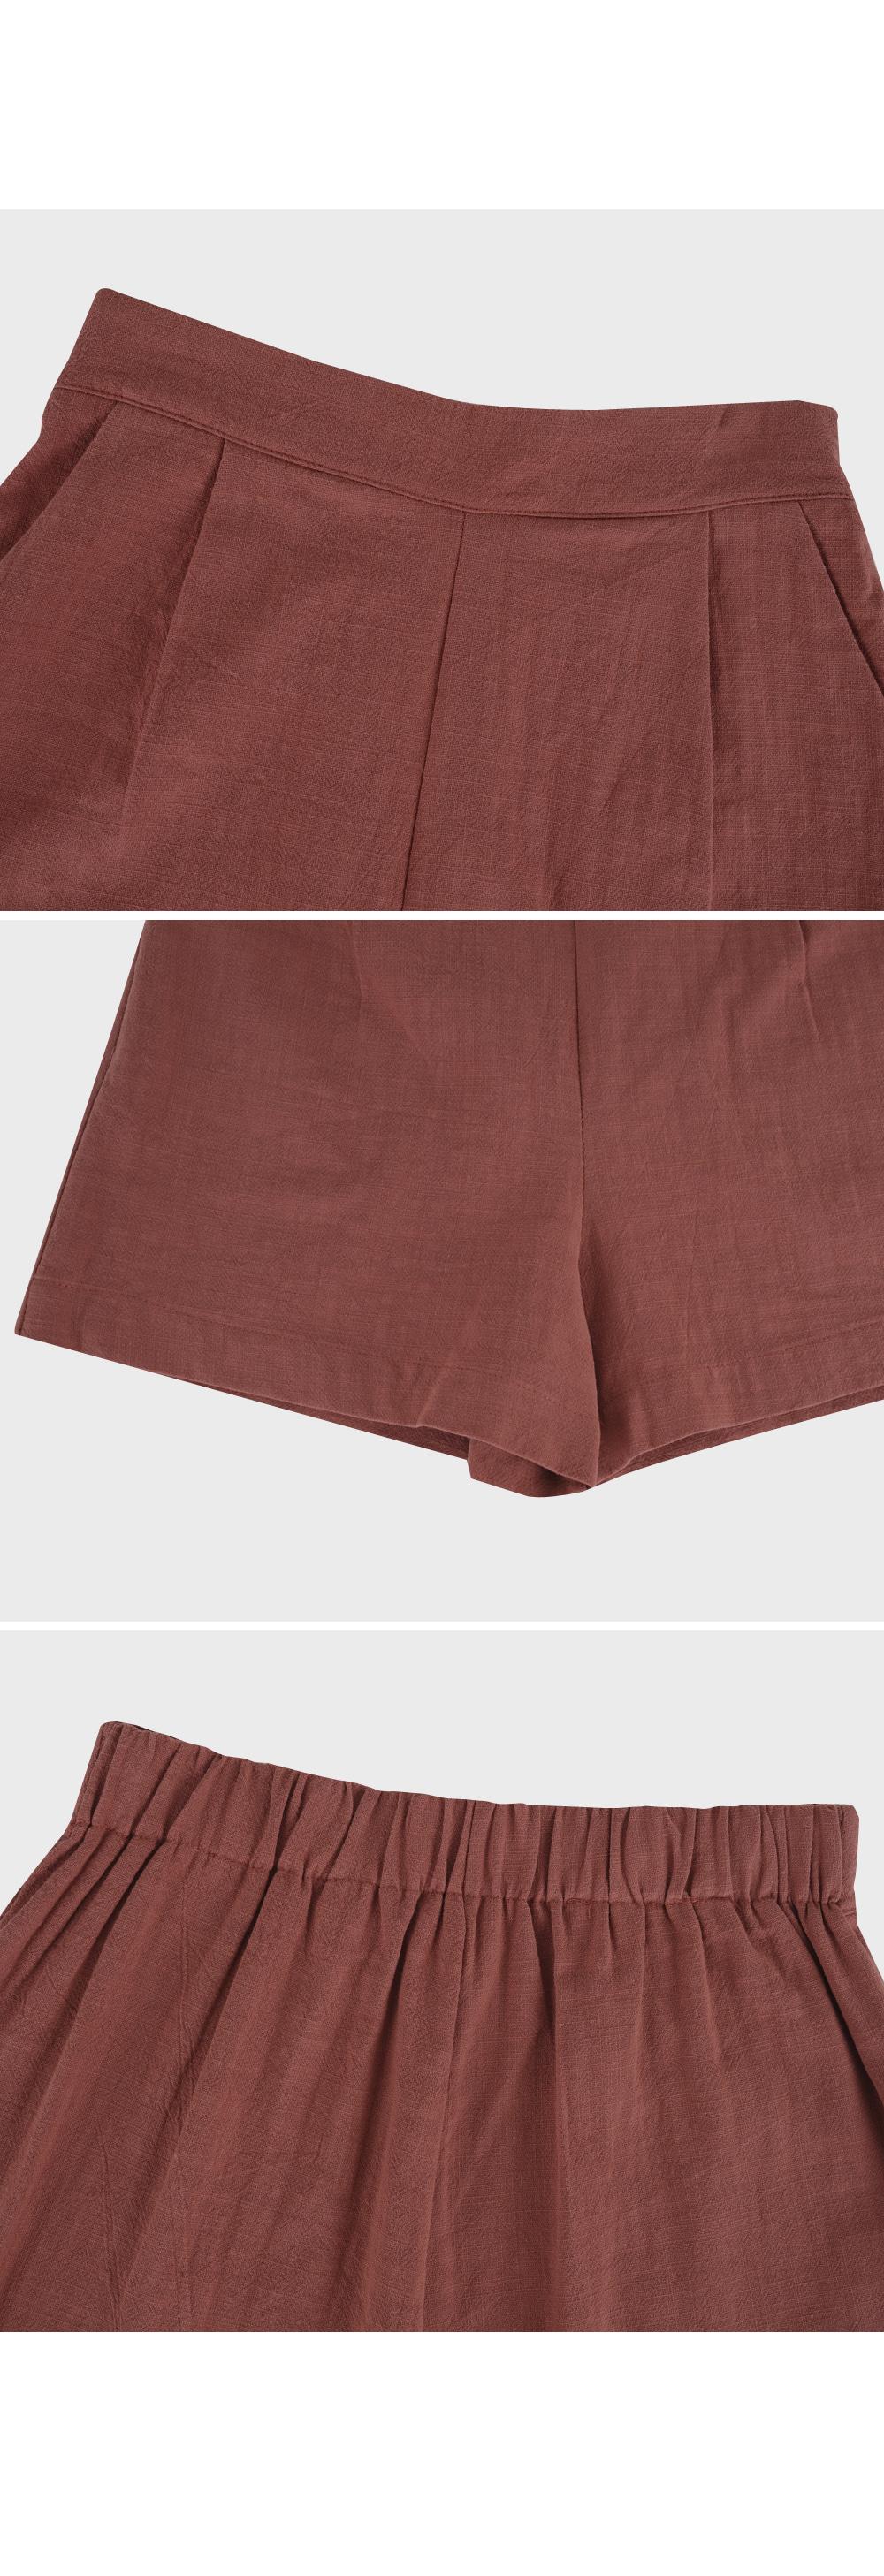 Elastic Waist Linen Short-holiholic.com